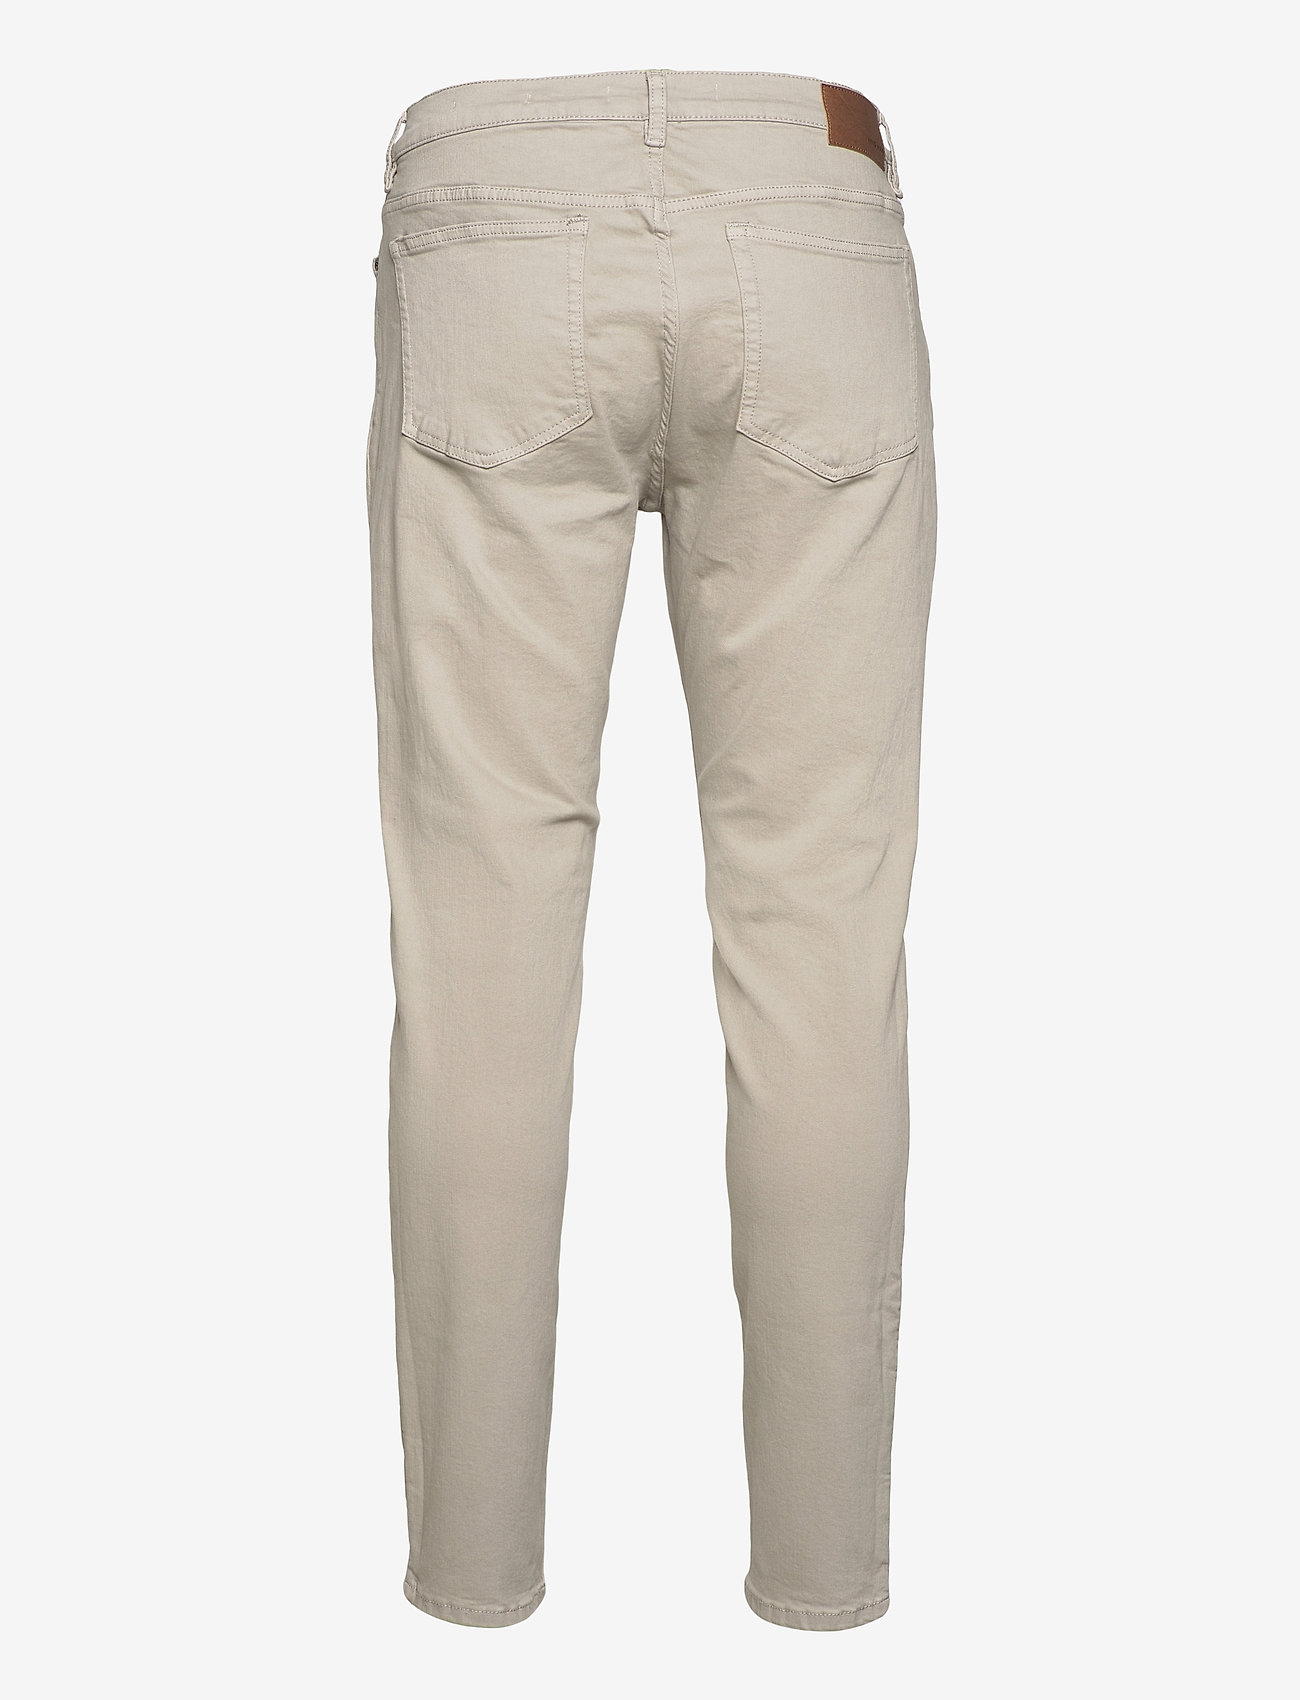 Mango BILLY - Jeans STONE - Menn Klær